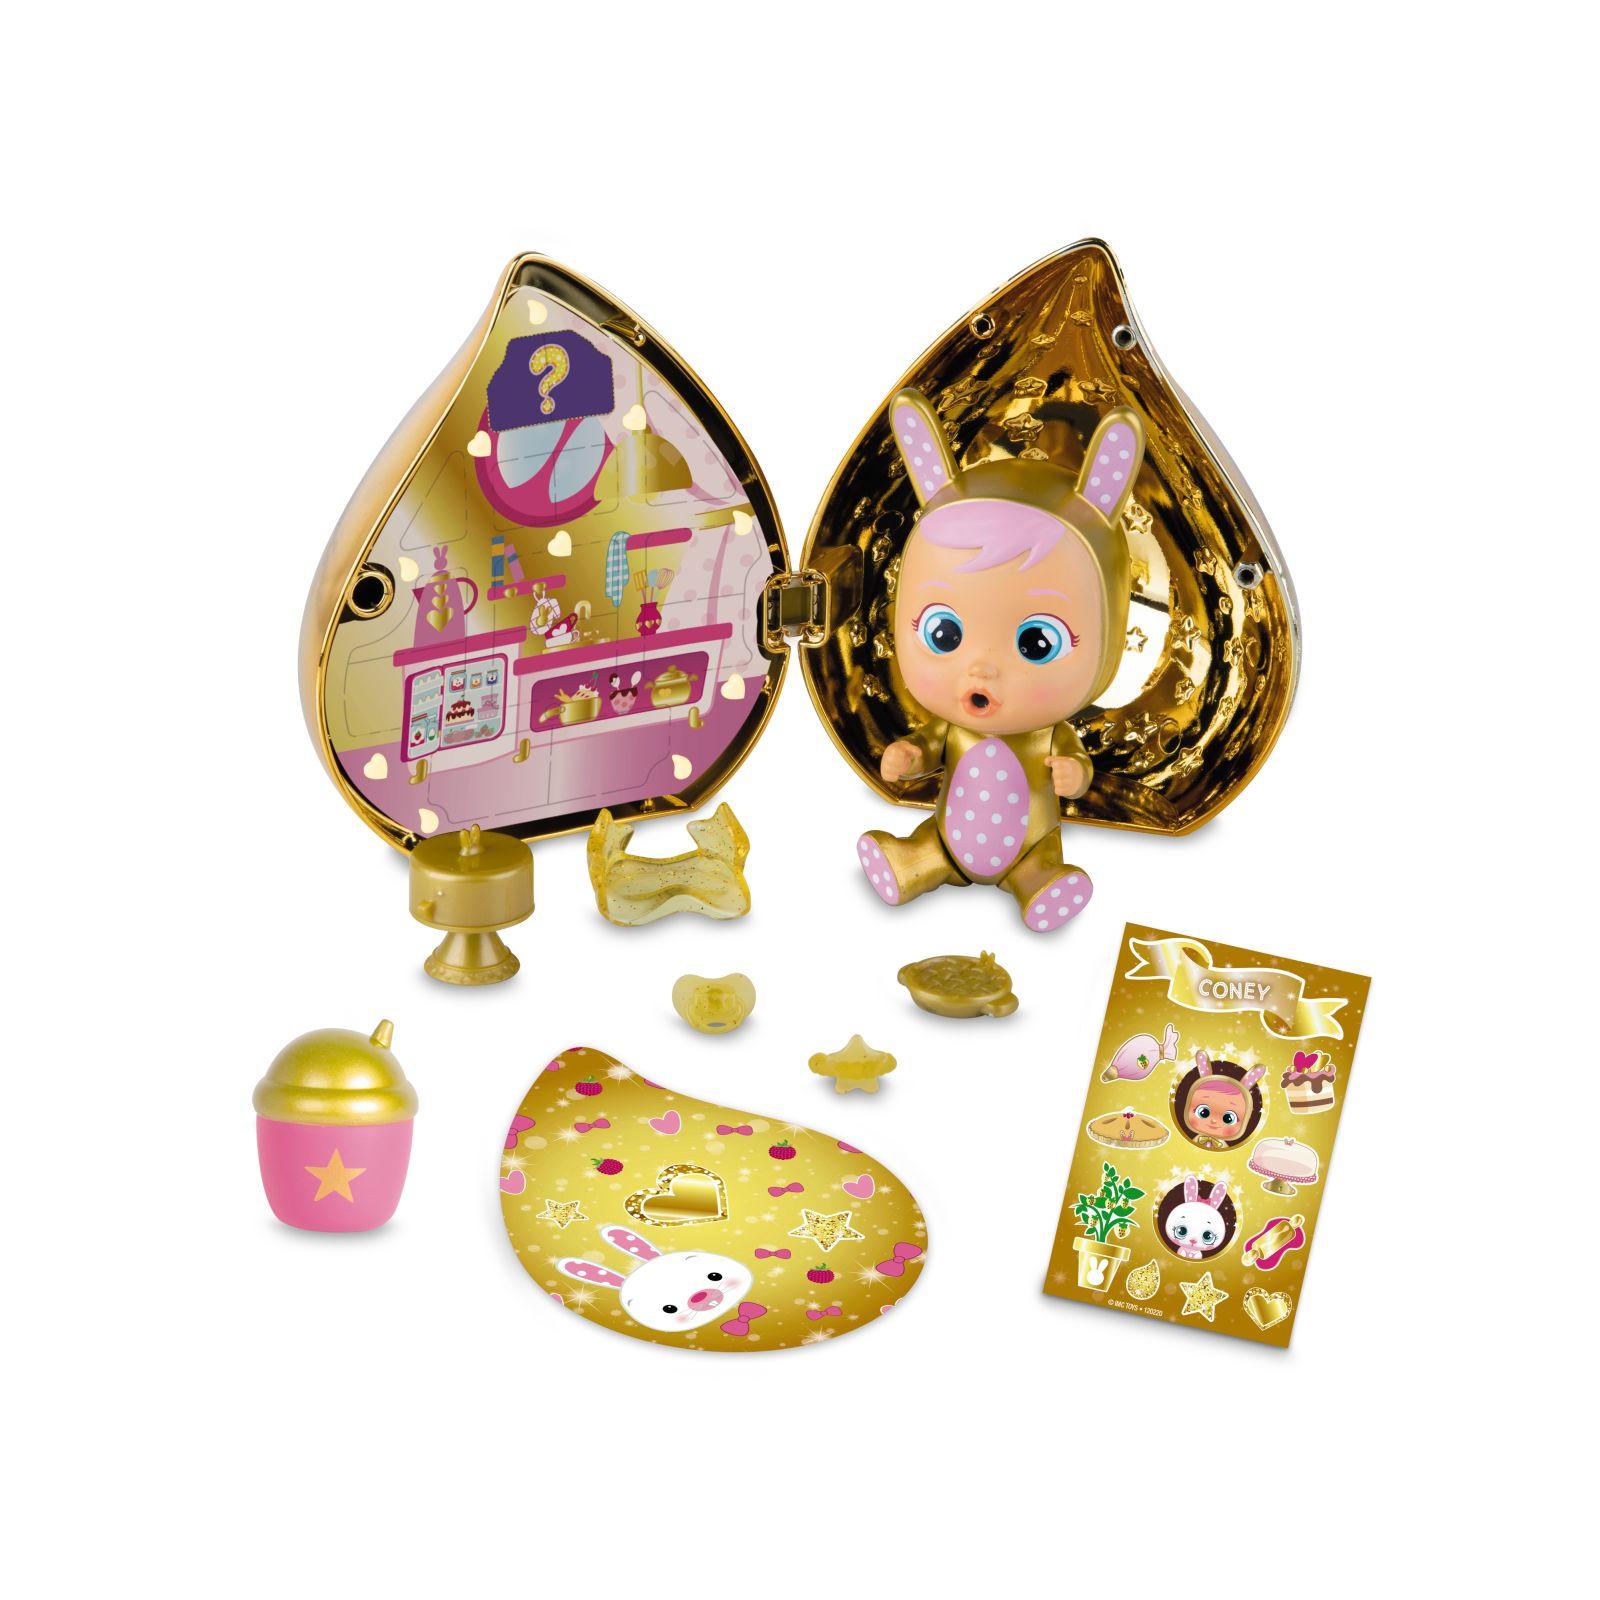 Cbmt series golden edition  cdu 12un -